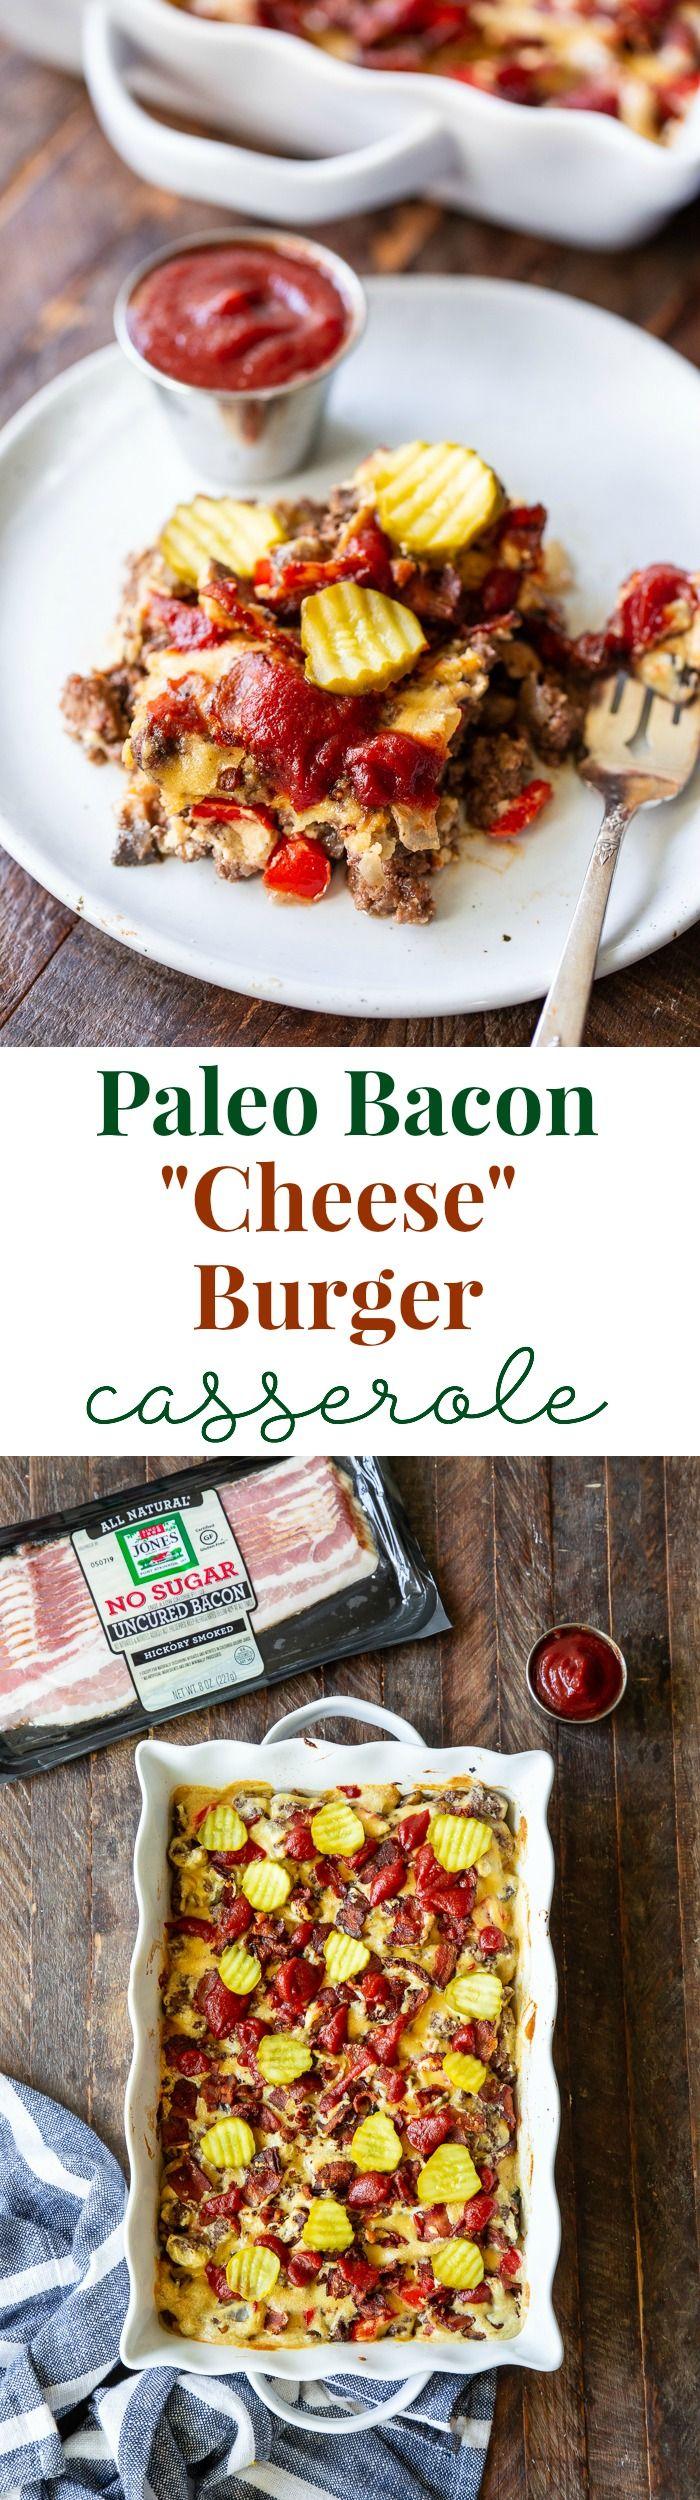 Bacon Cheeseburger Casserole Paleo No Added Sugar Recipe Bacon Cheeseburger Casserole Paleo Comfort Food Recipes Casseroles